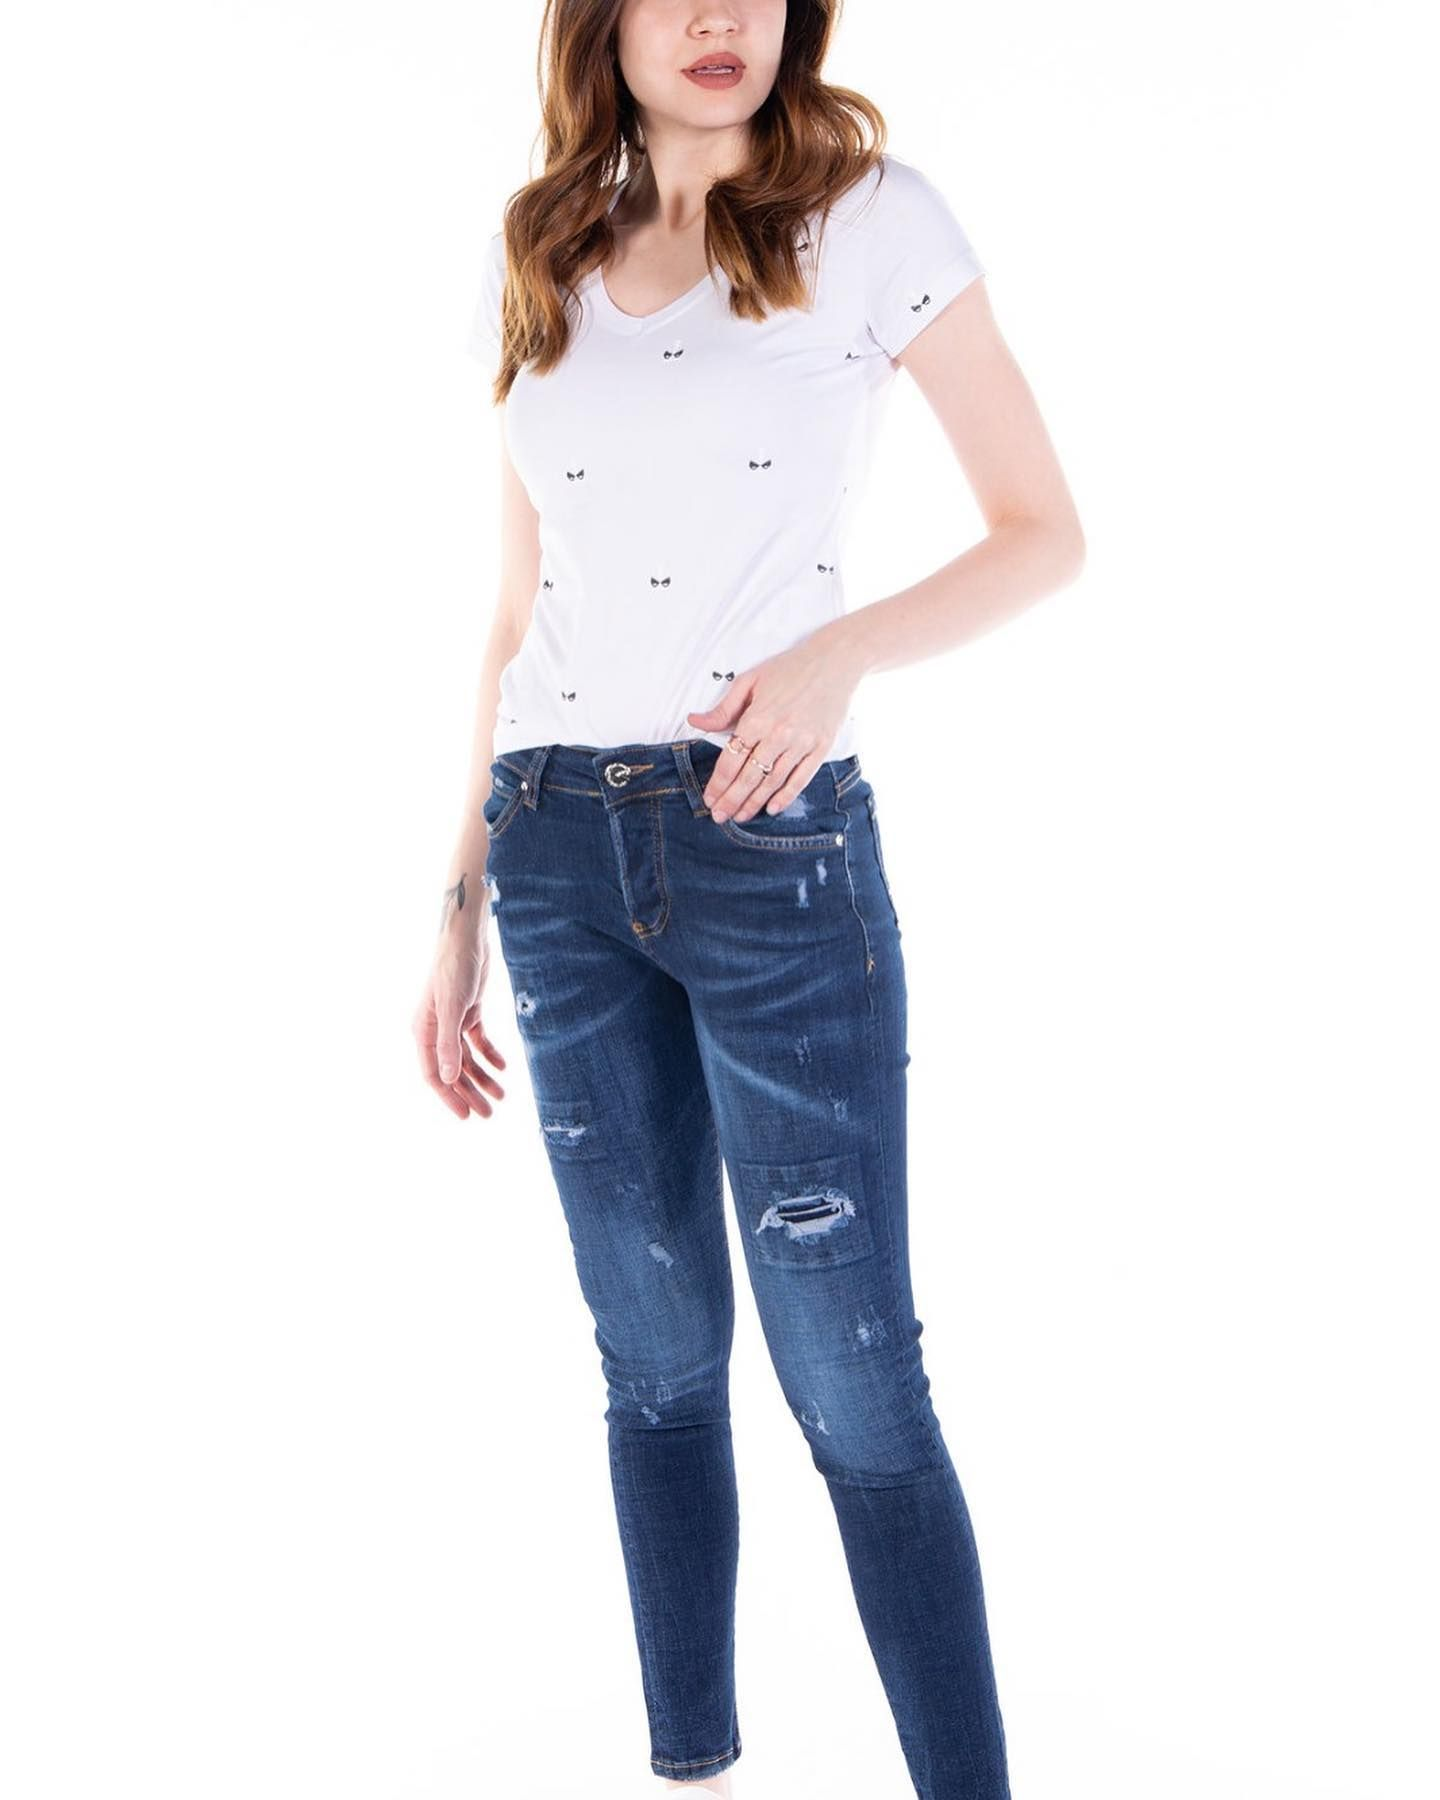 Viking Jeans Woman Panosundaki Pin